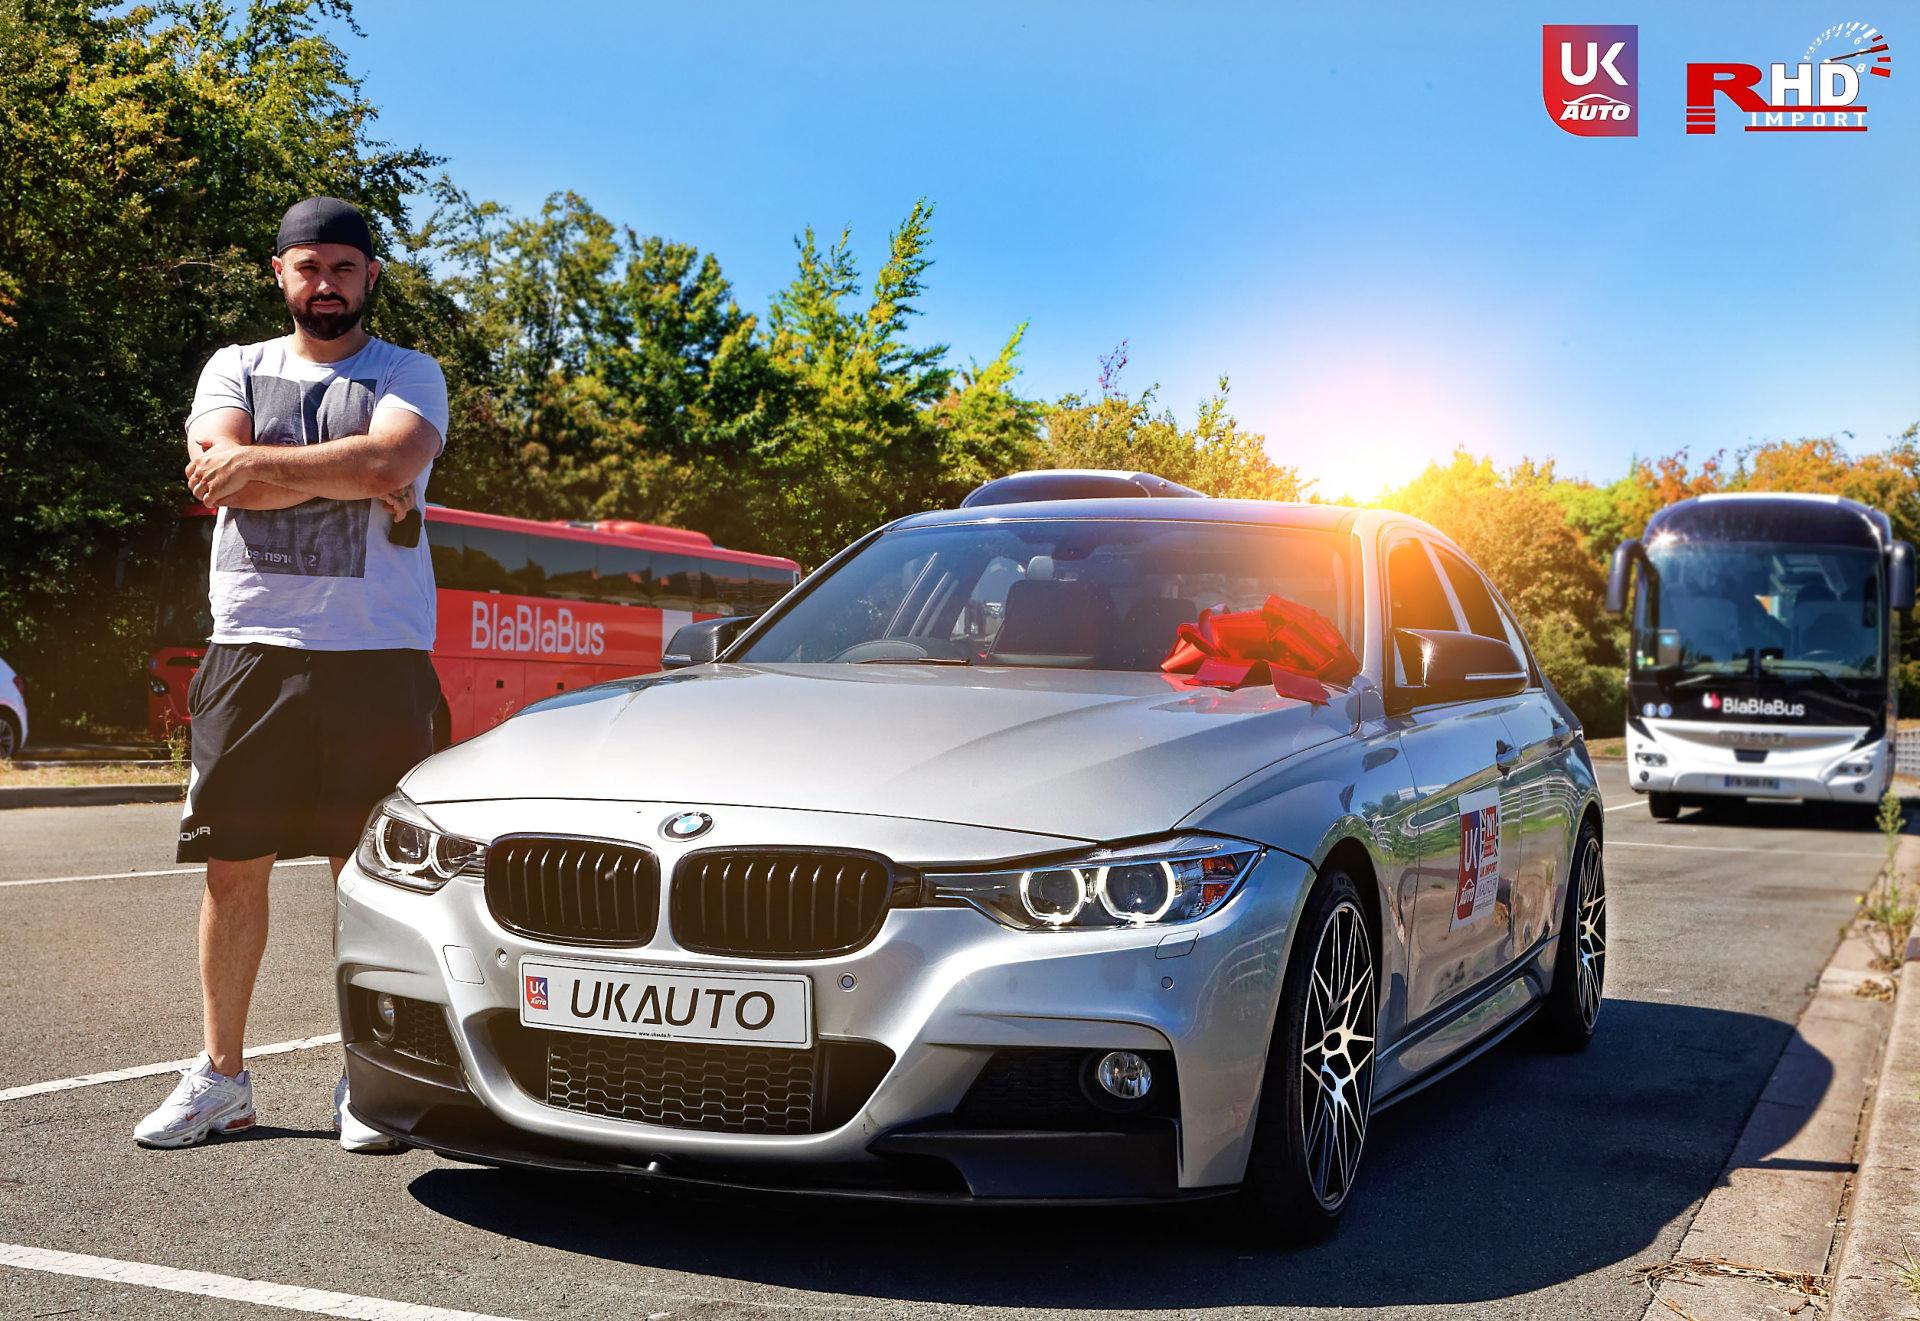 Bmw 335I IMPORT F30 eric drouet import bmw occasion rhd mandataire bmw angleterre13 DxO - IMPORTATION BMW 335 I FELICITATION A ERIC DROUET BMW VOITURE SPORTIVE UK